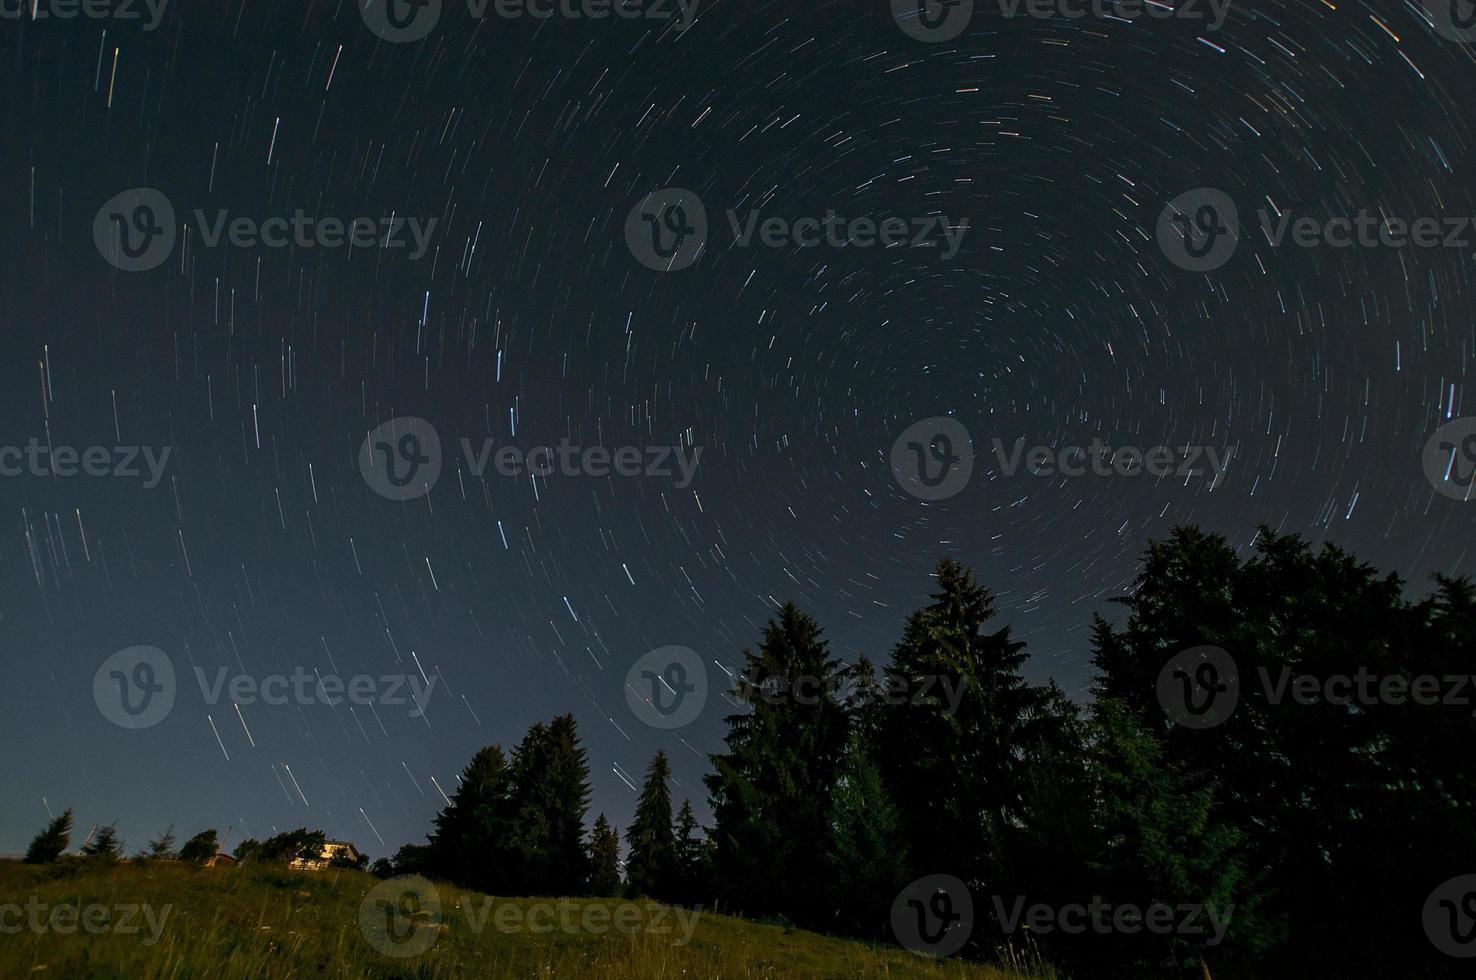 traiis étoiles courtes photo